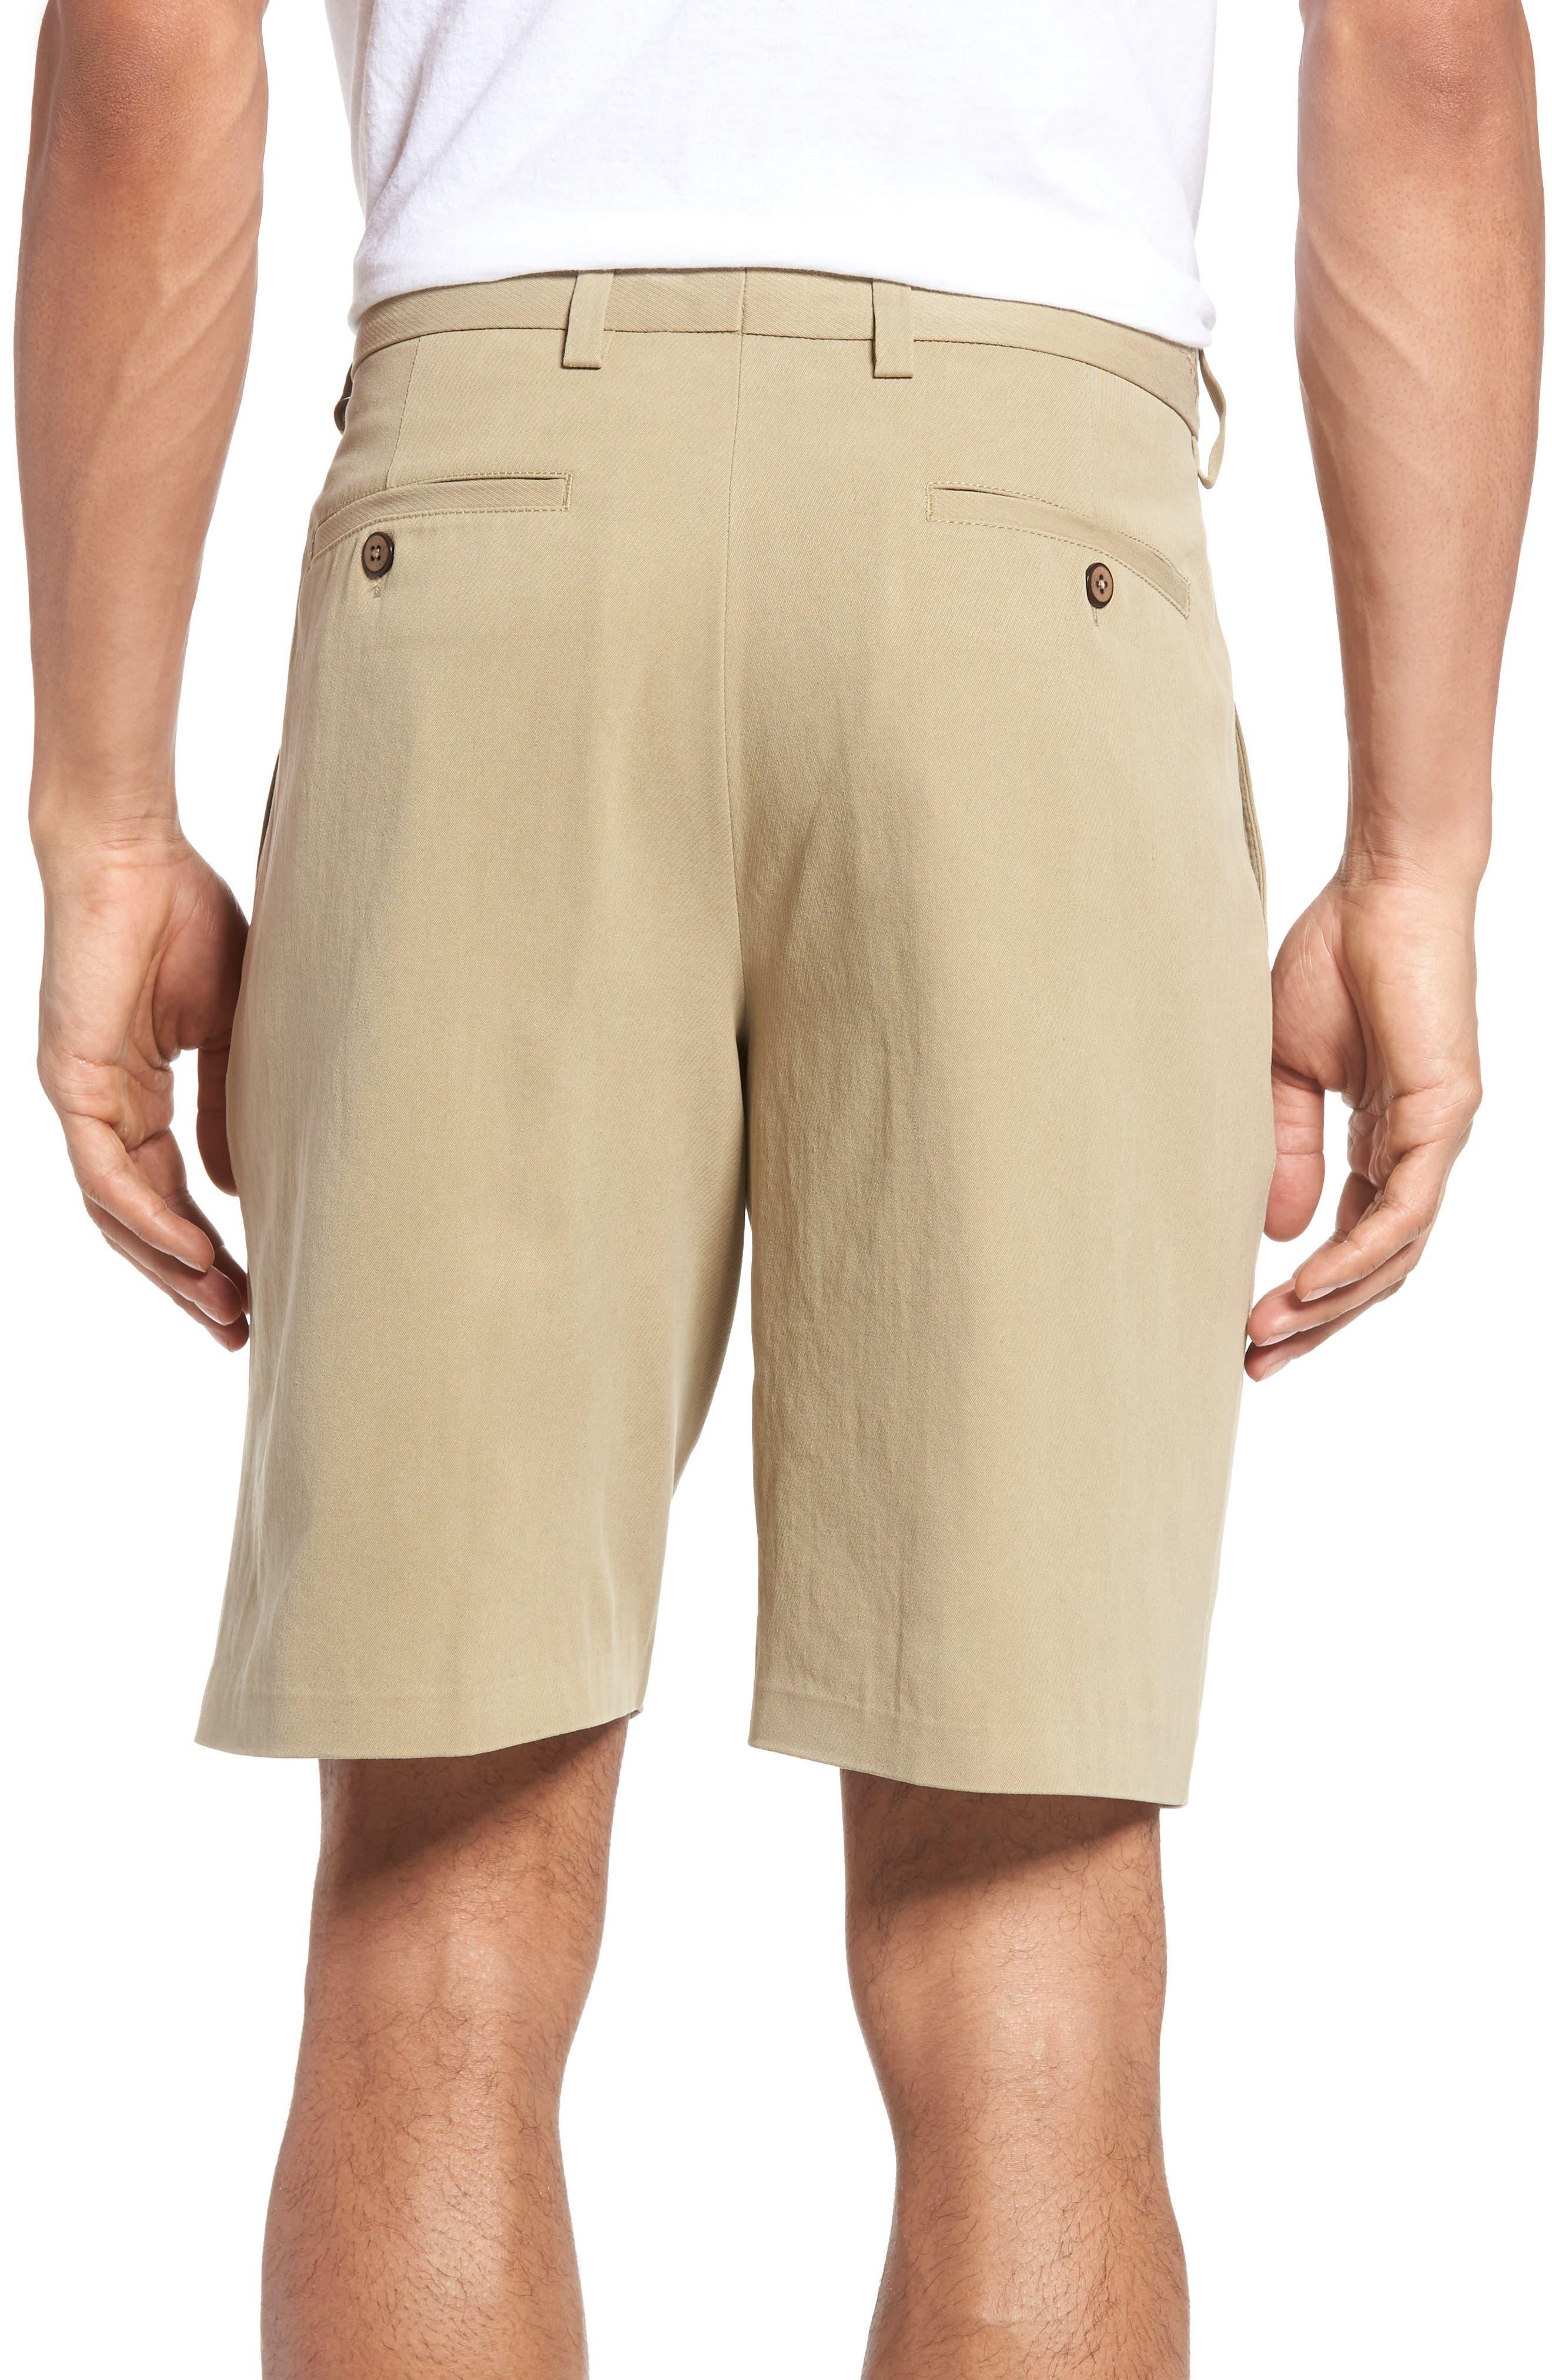 St. Thomas Pleated Shorts,                             Alternate thumbnail 2, color,                             Sisal